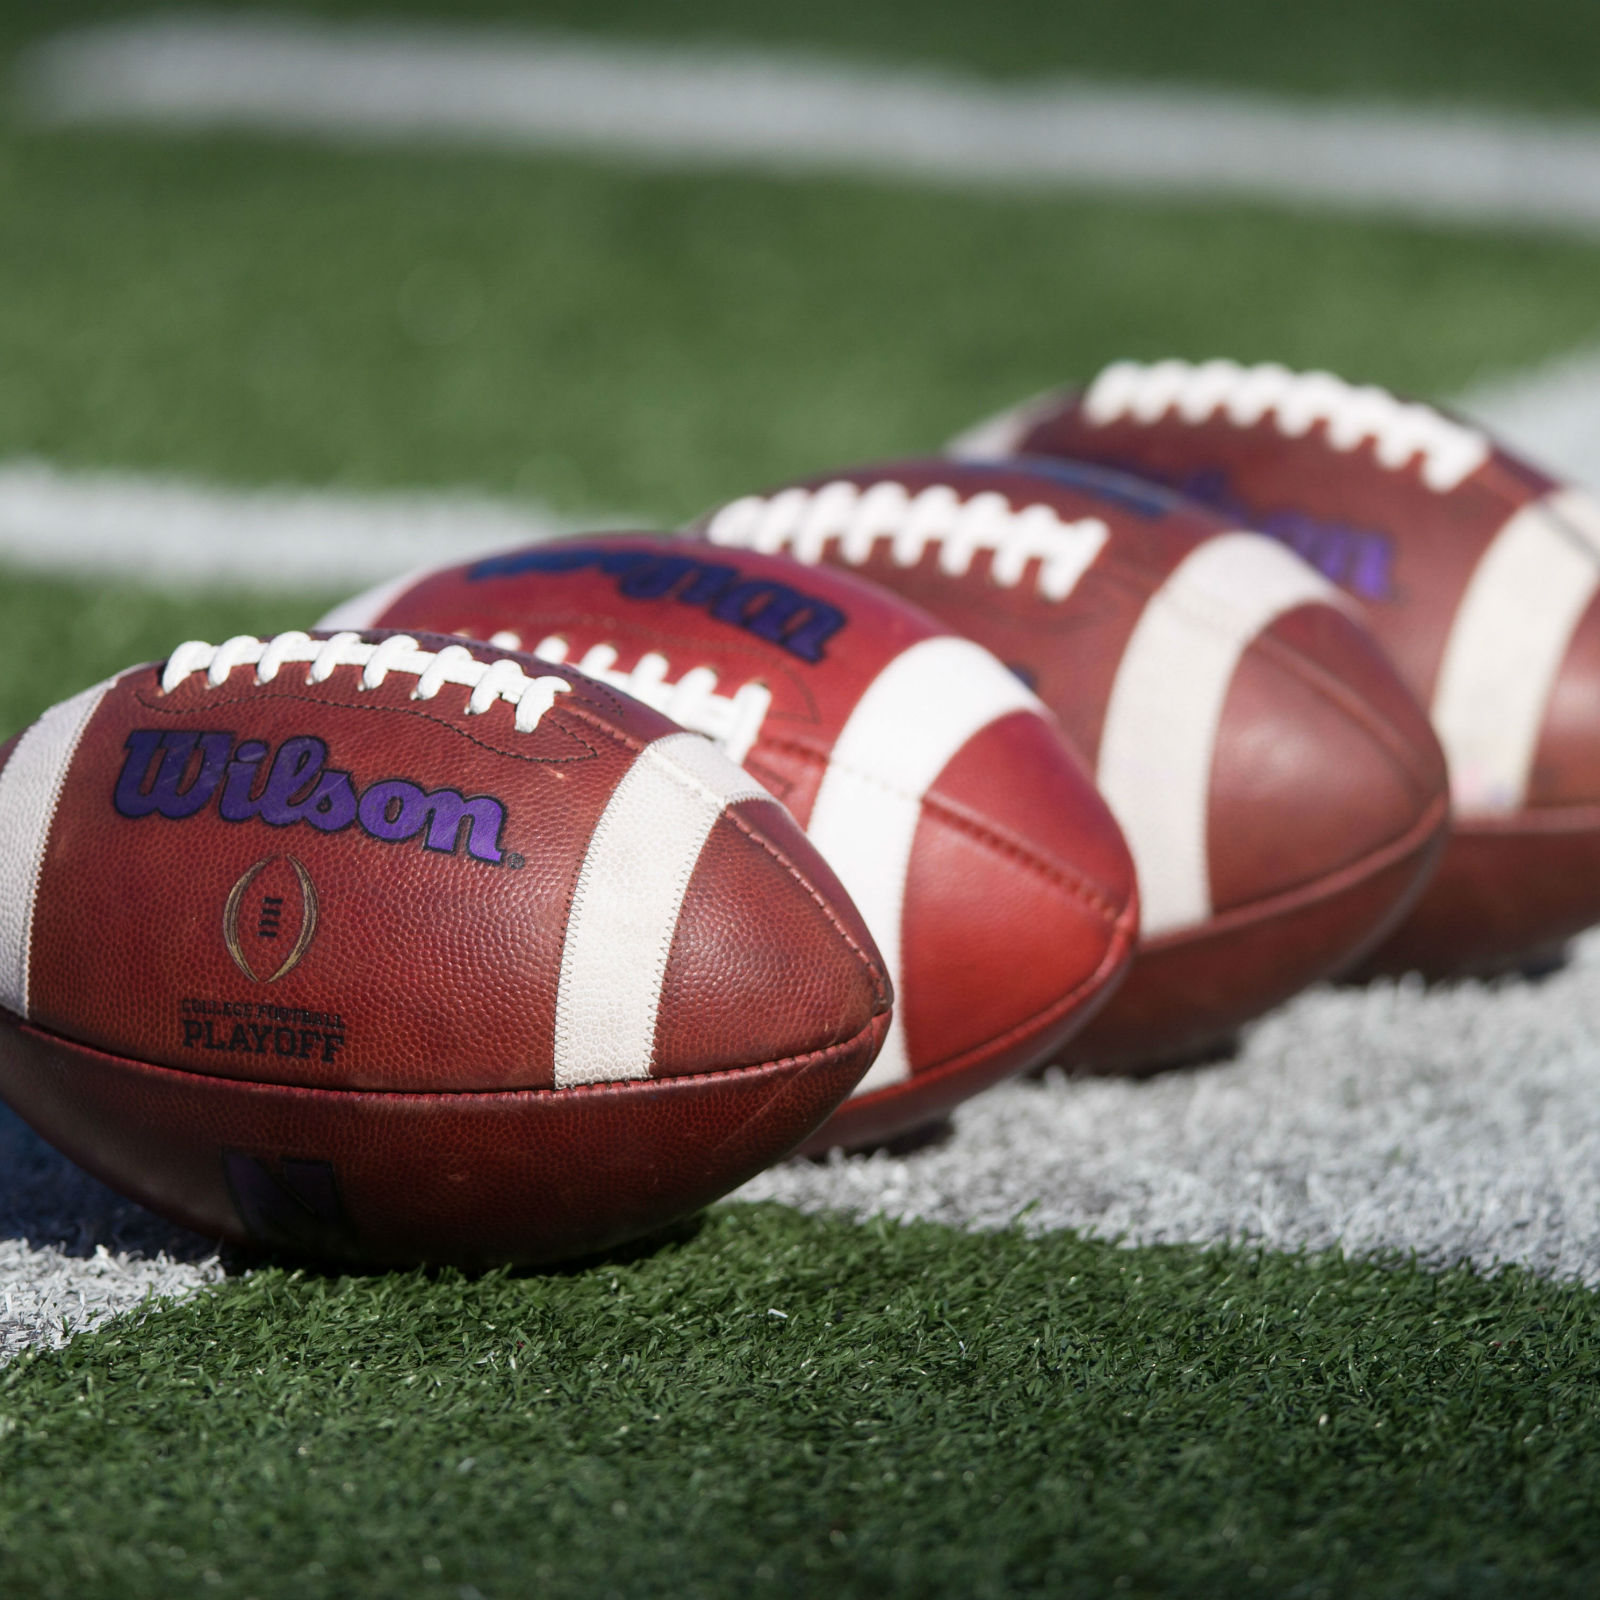 College football betting strategies huesca vs villarreal betting tips